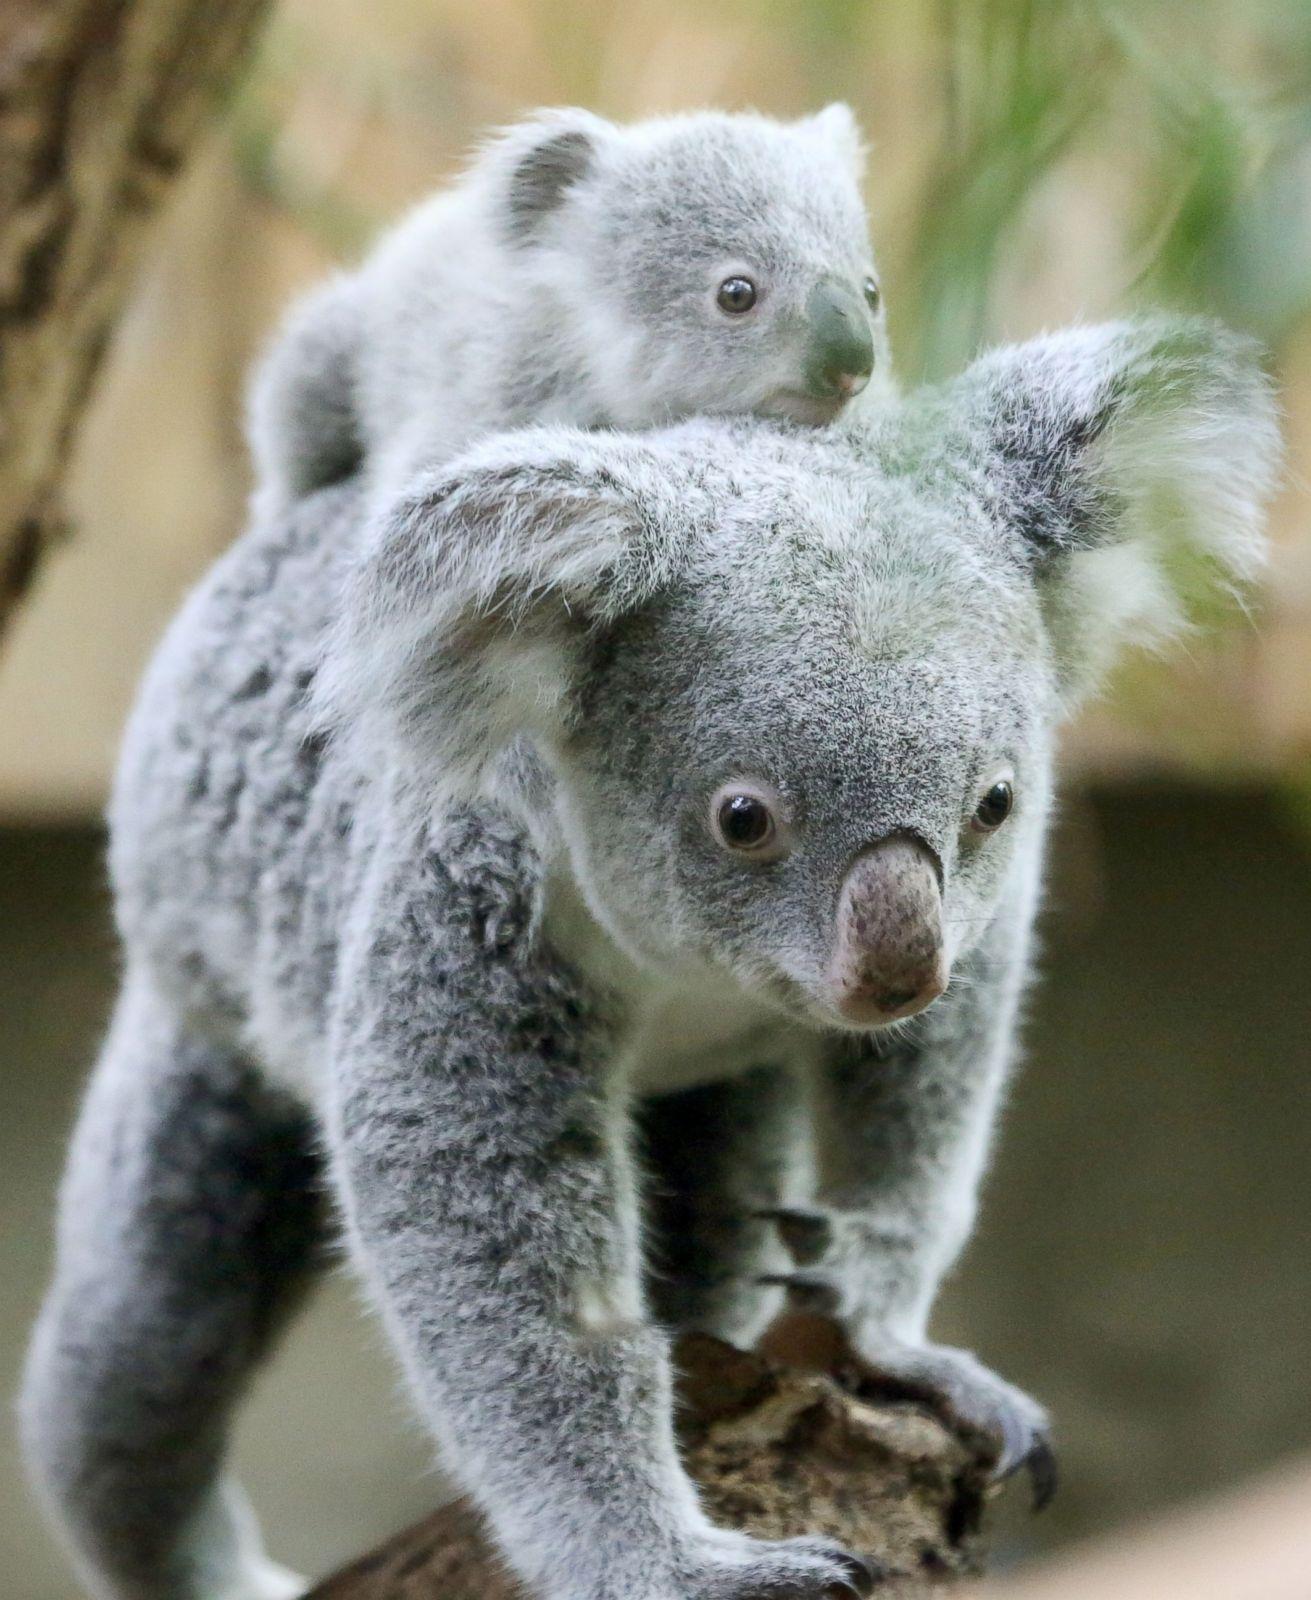 Cutest baby animals from around the world Photos  ABC News